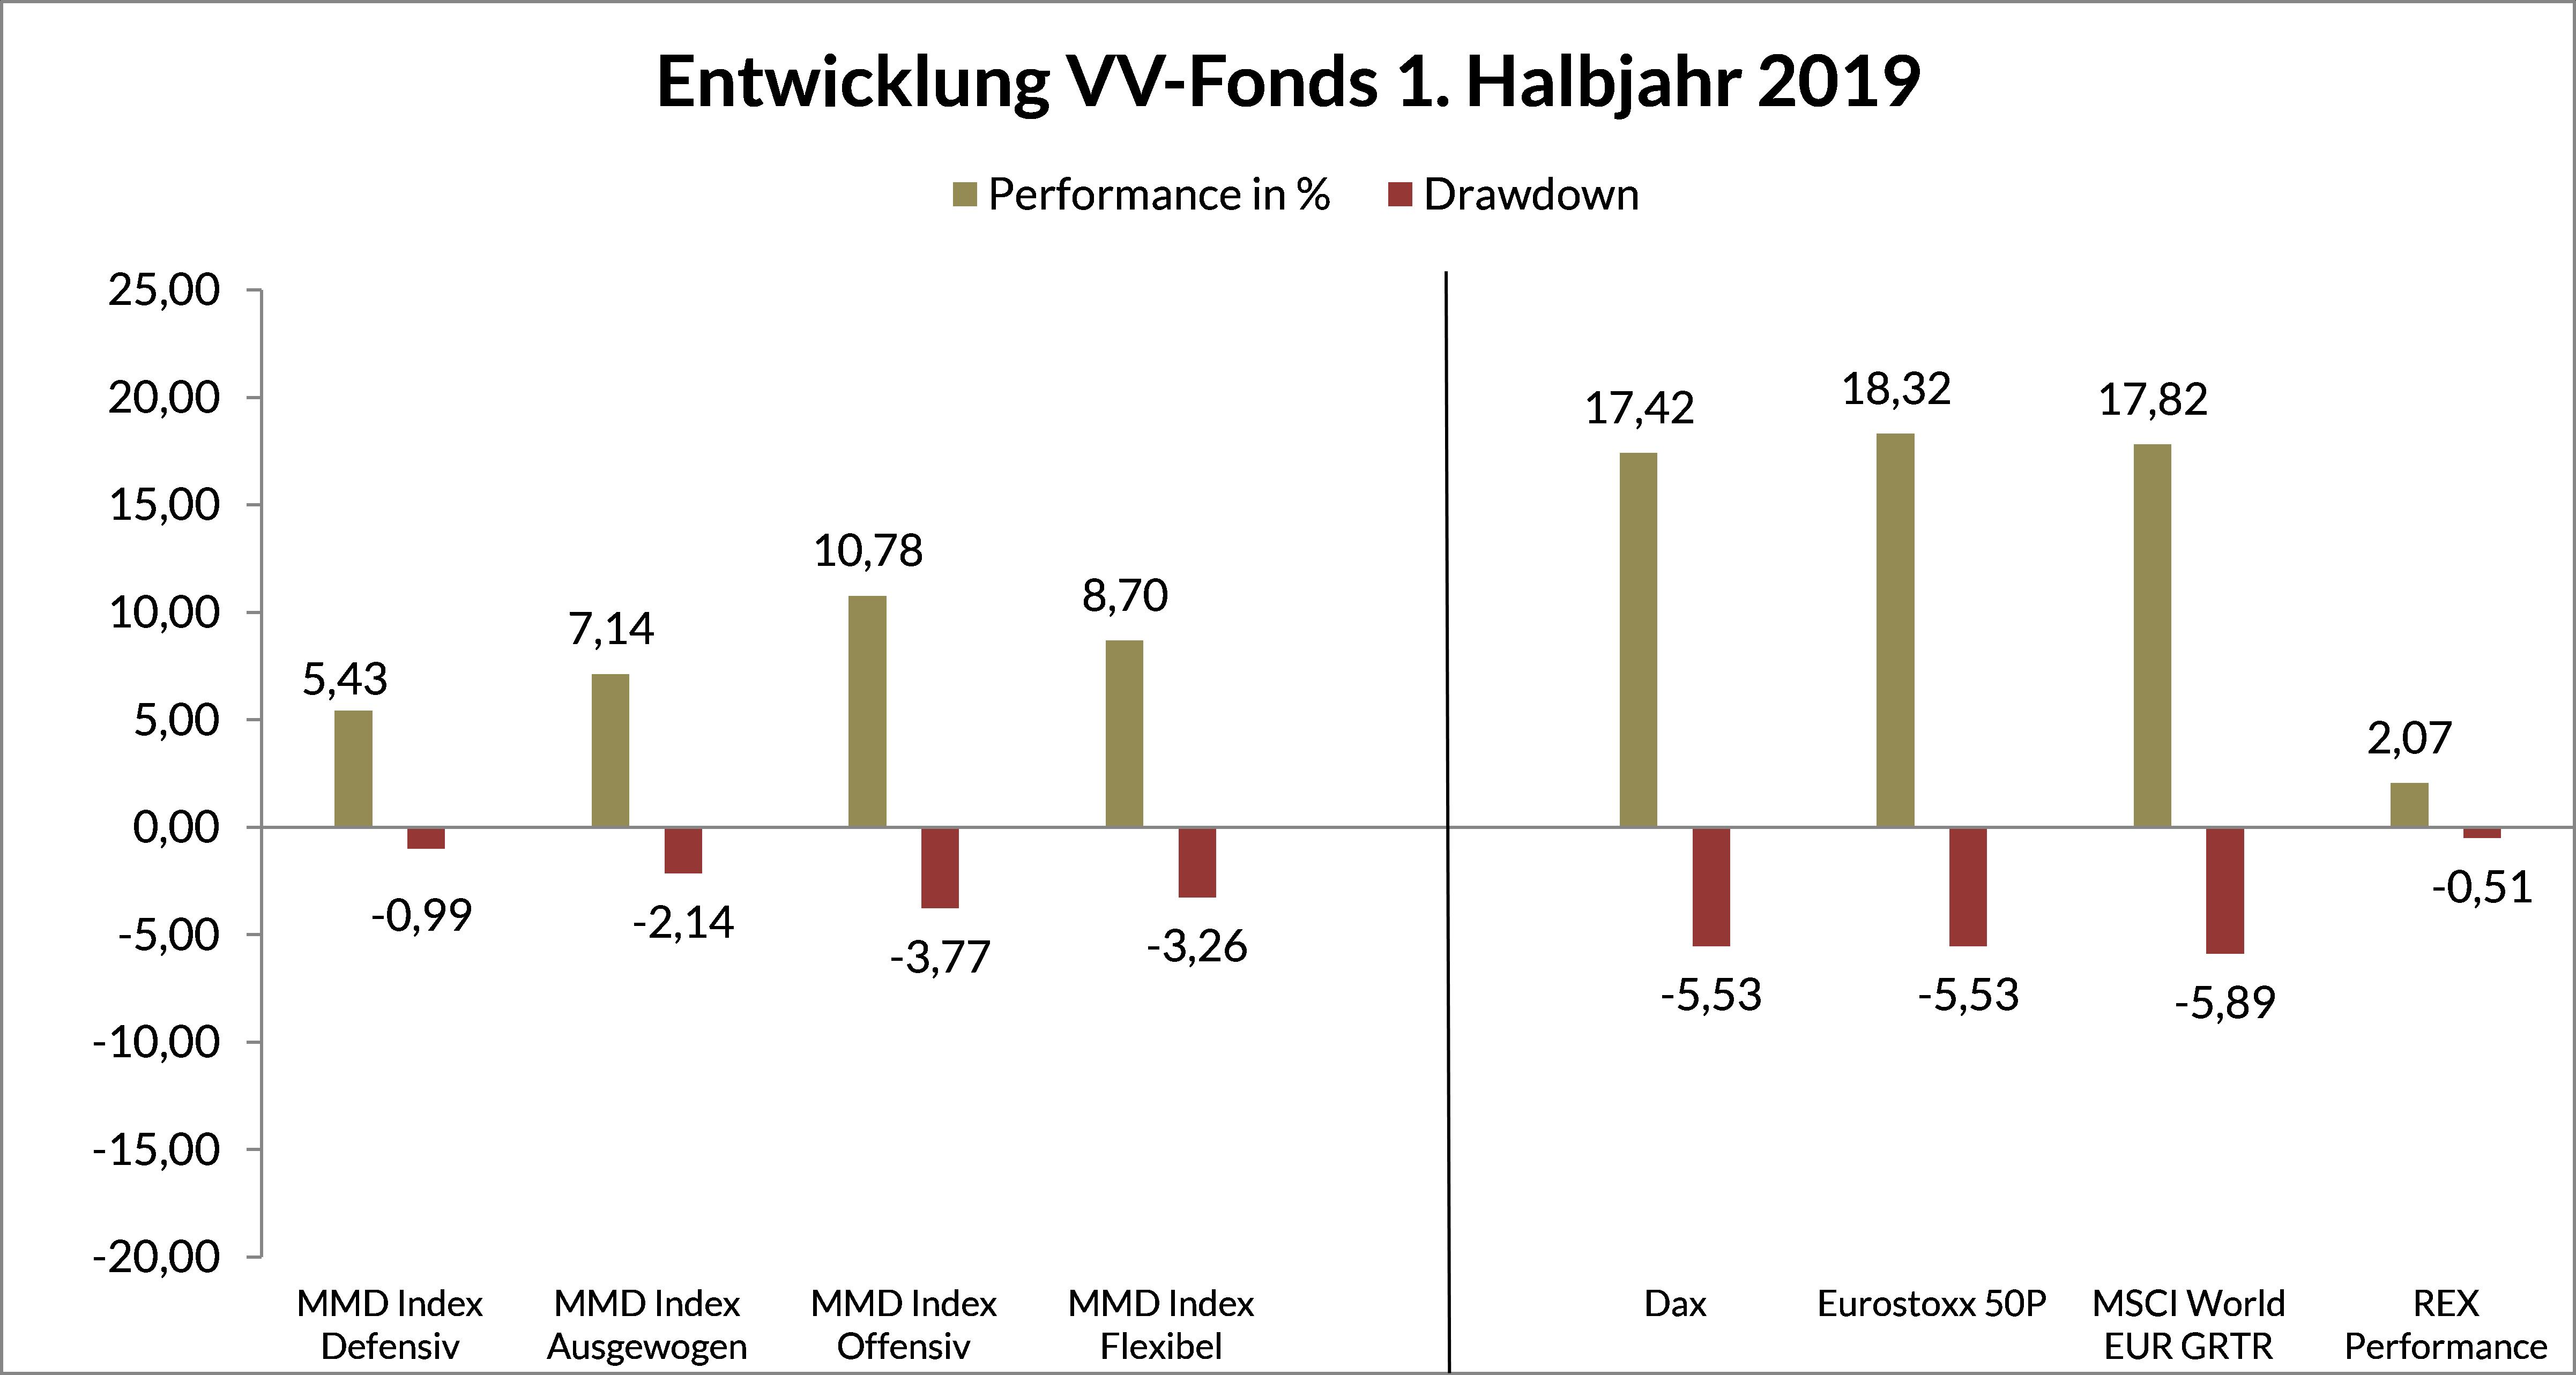 Grafik 1 - Entwicklung VV-Fonds HJ 1 2019